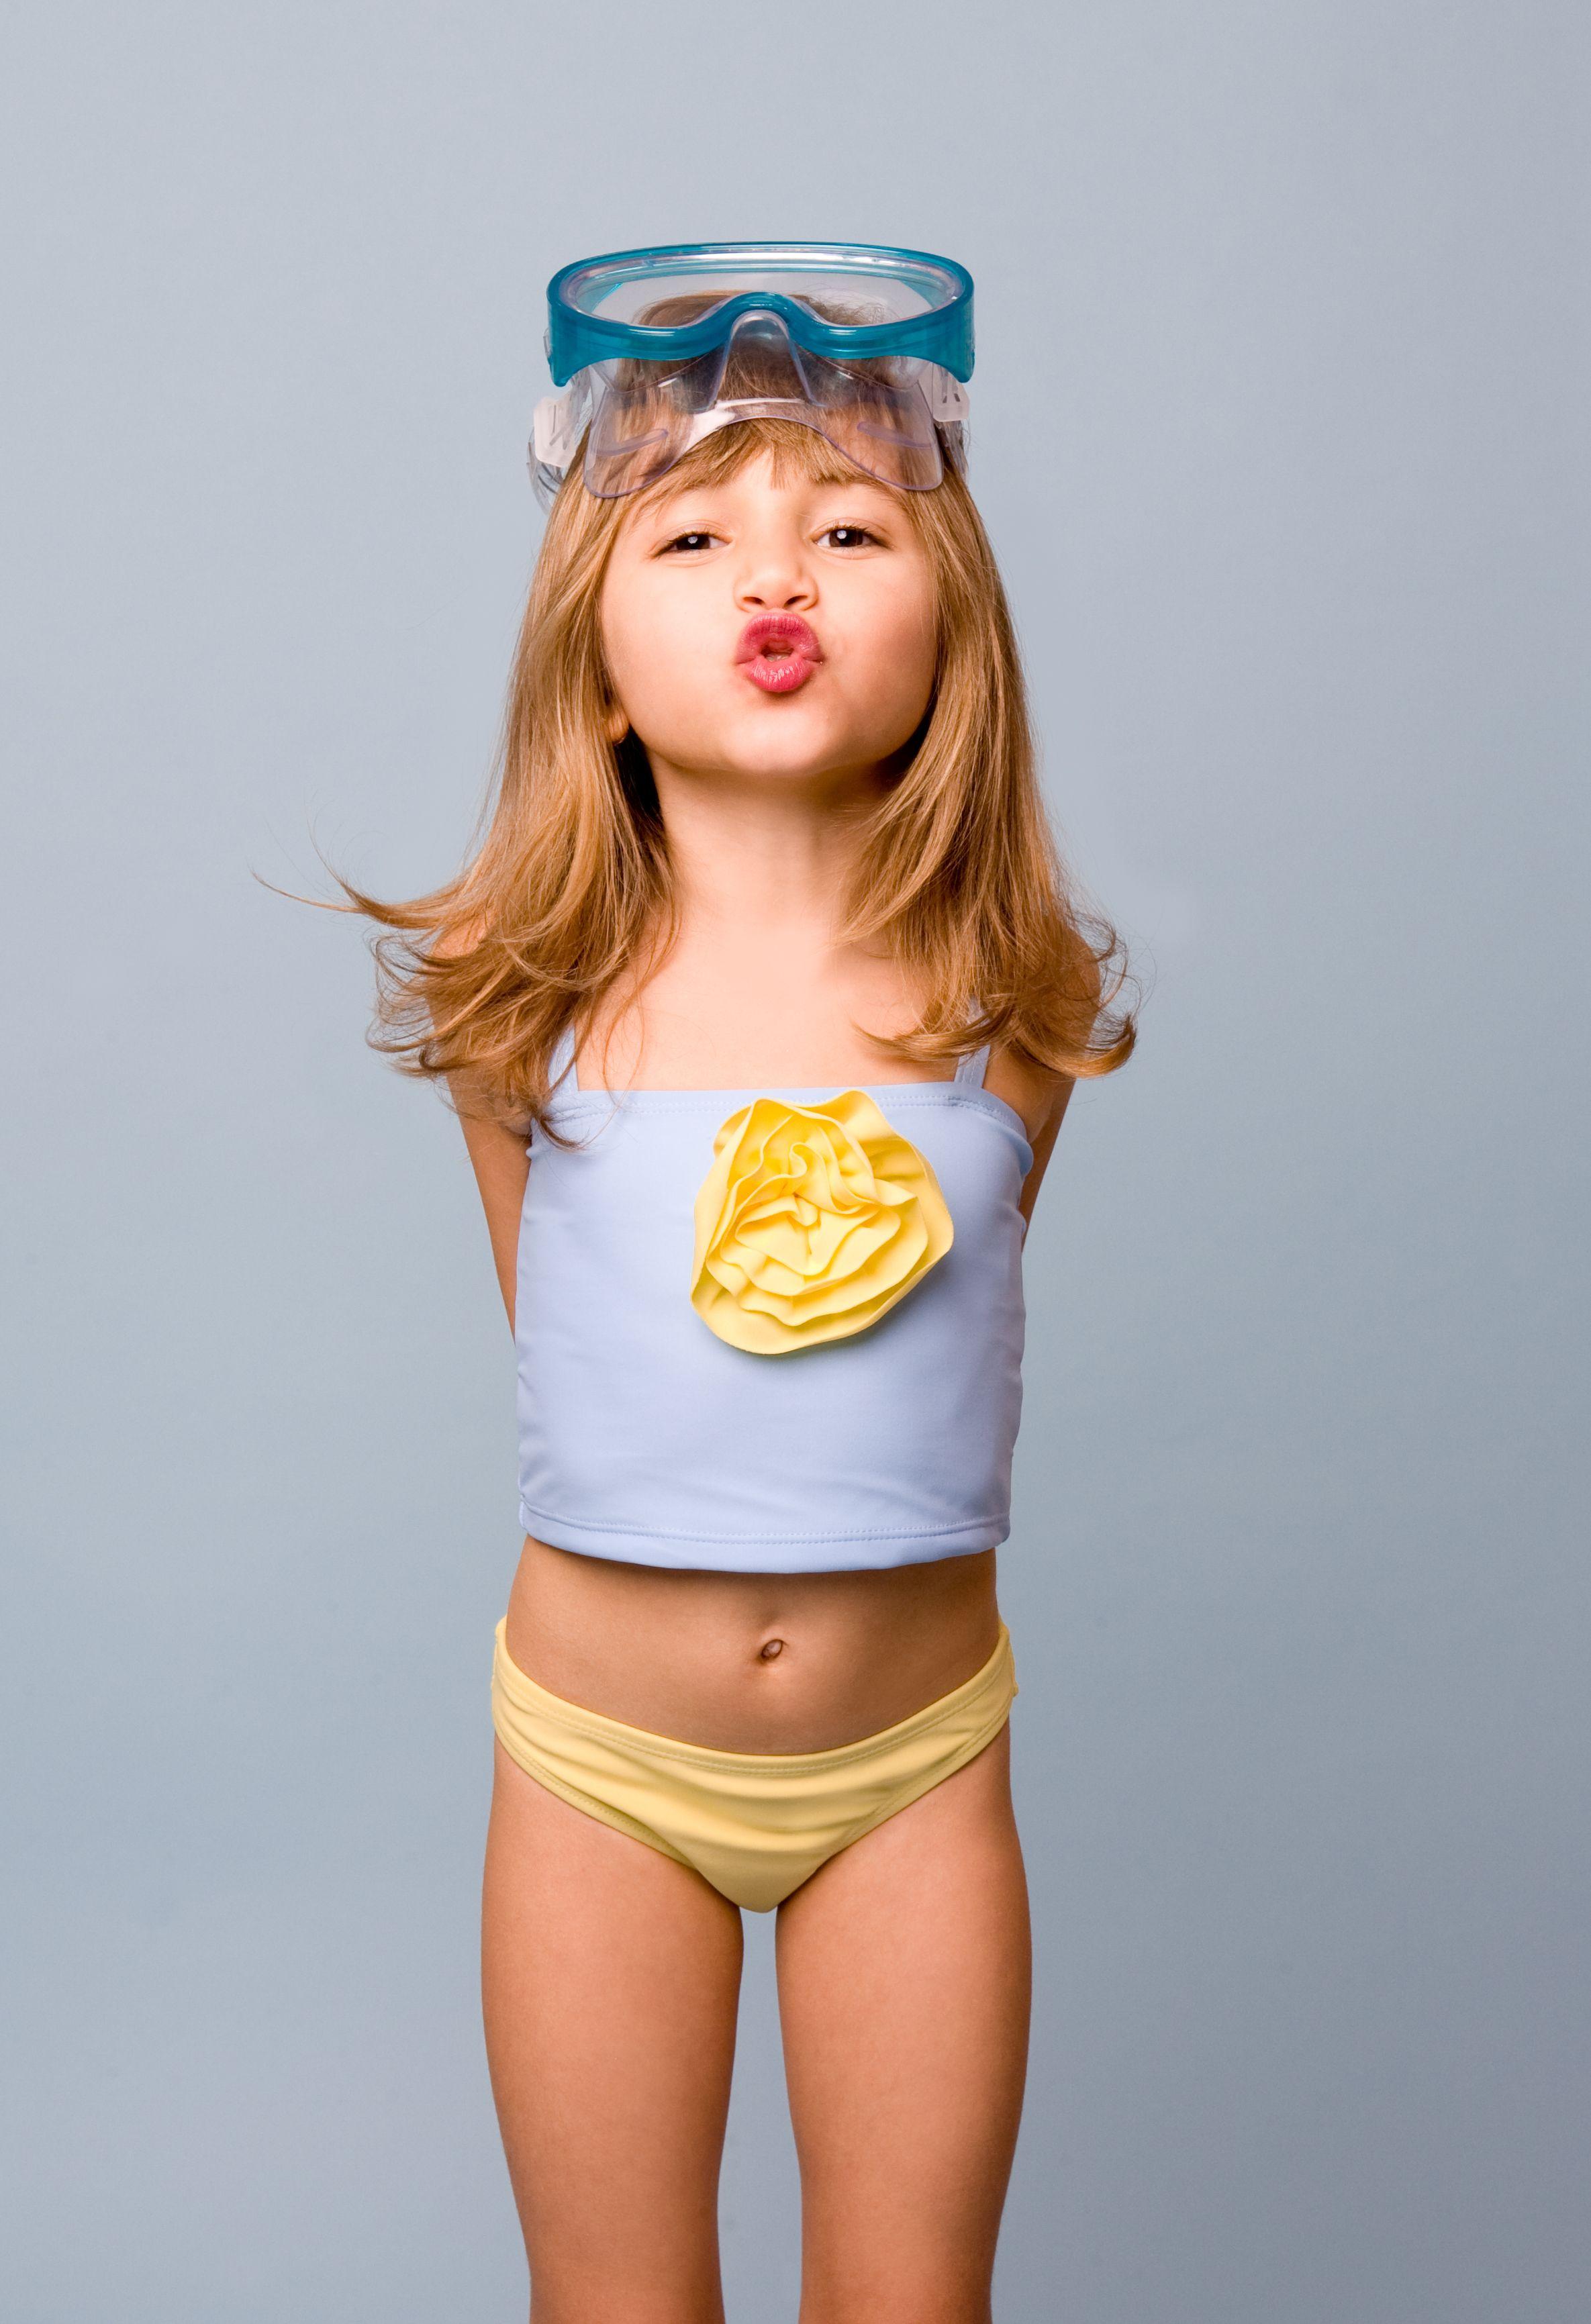 Boy Models Swimwear Free Pics